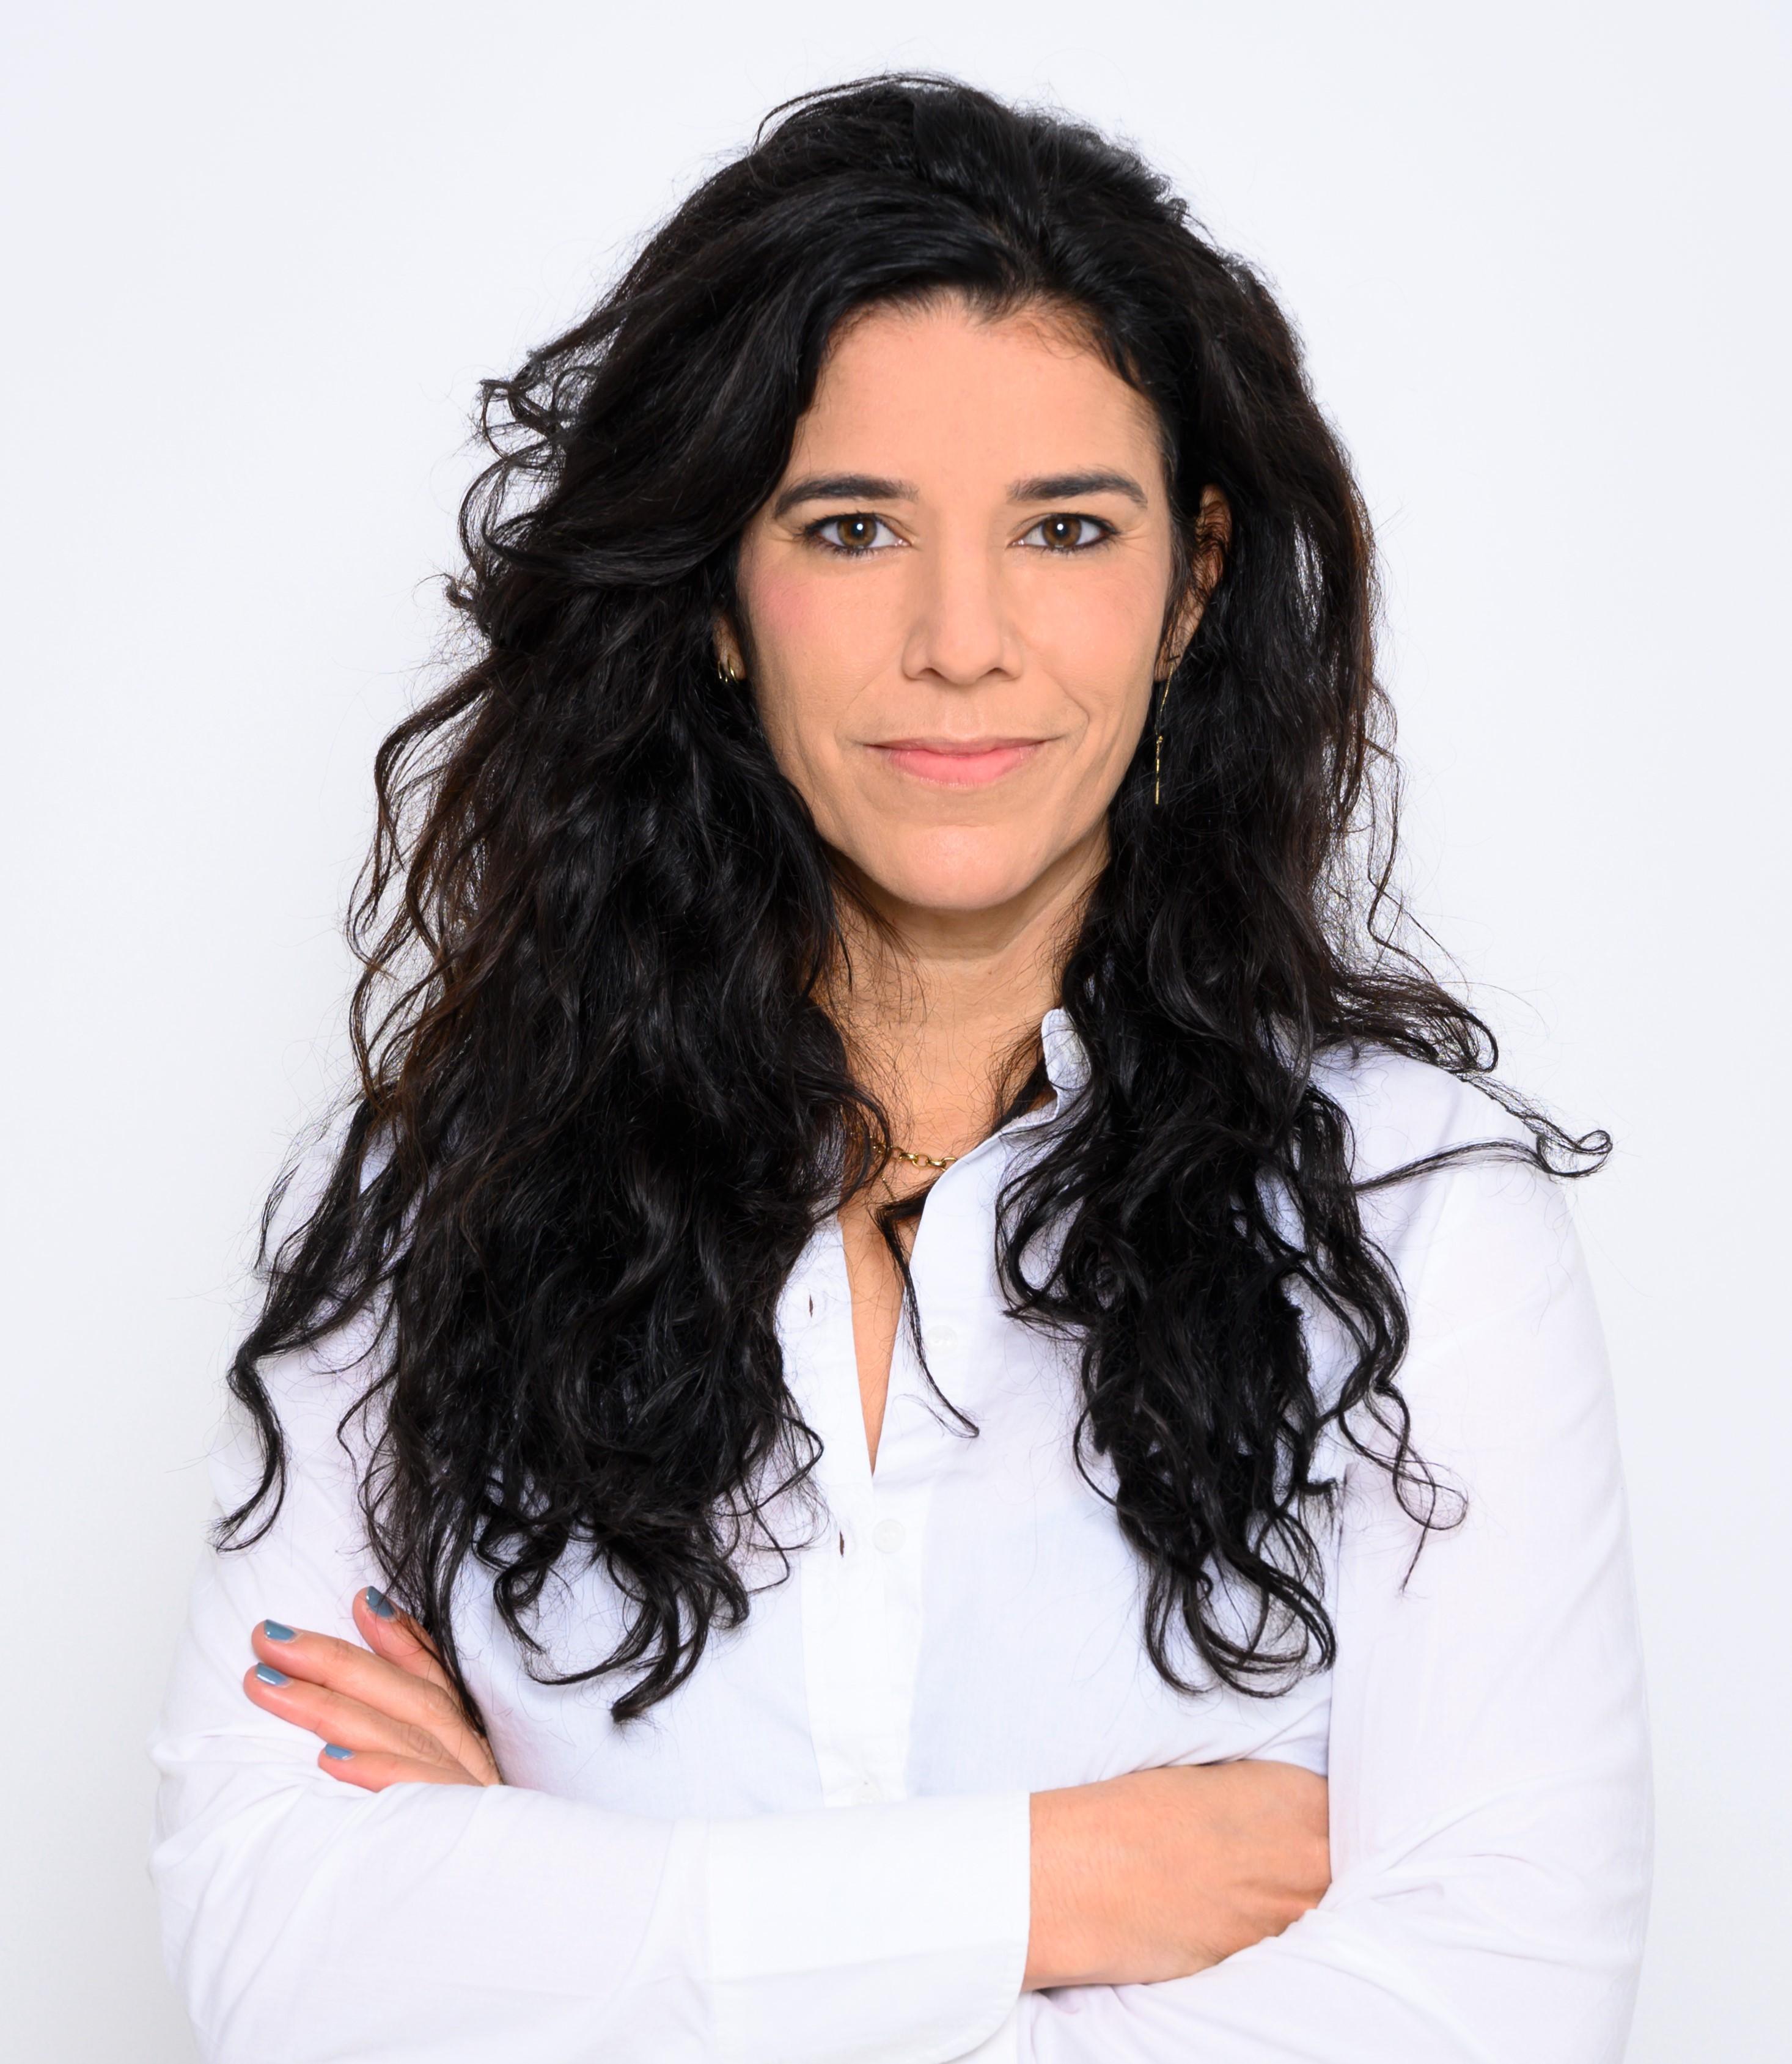 Marleen Evertsz